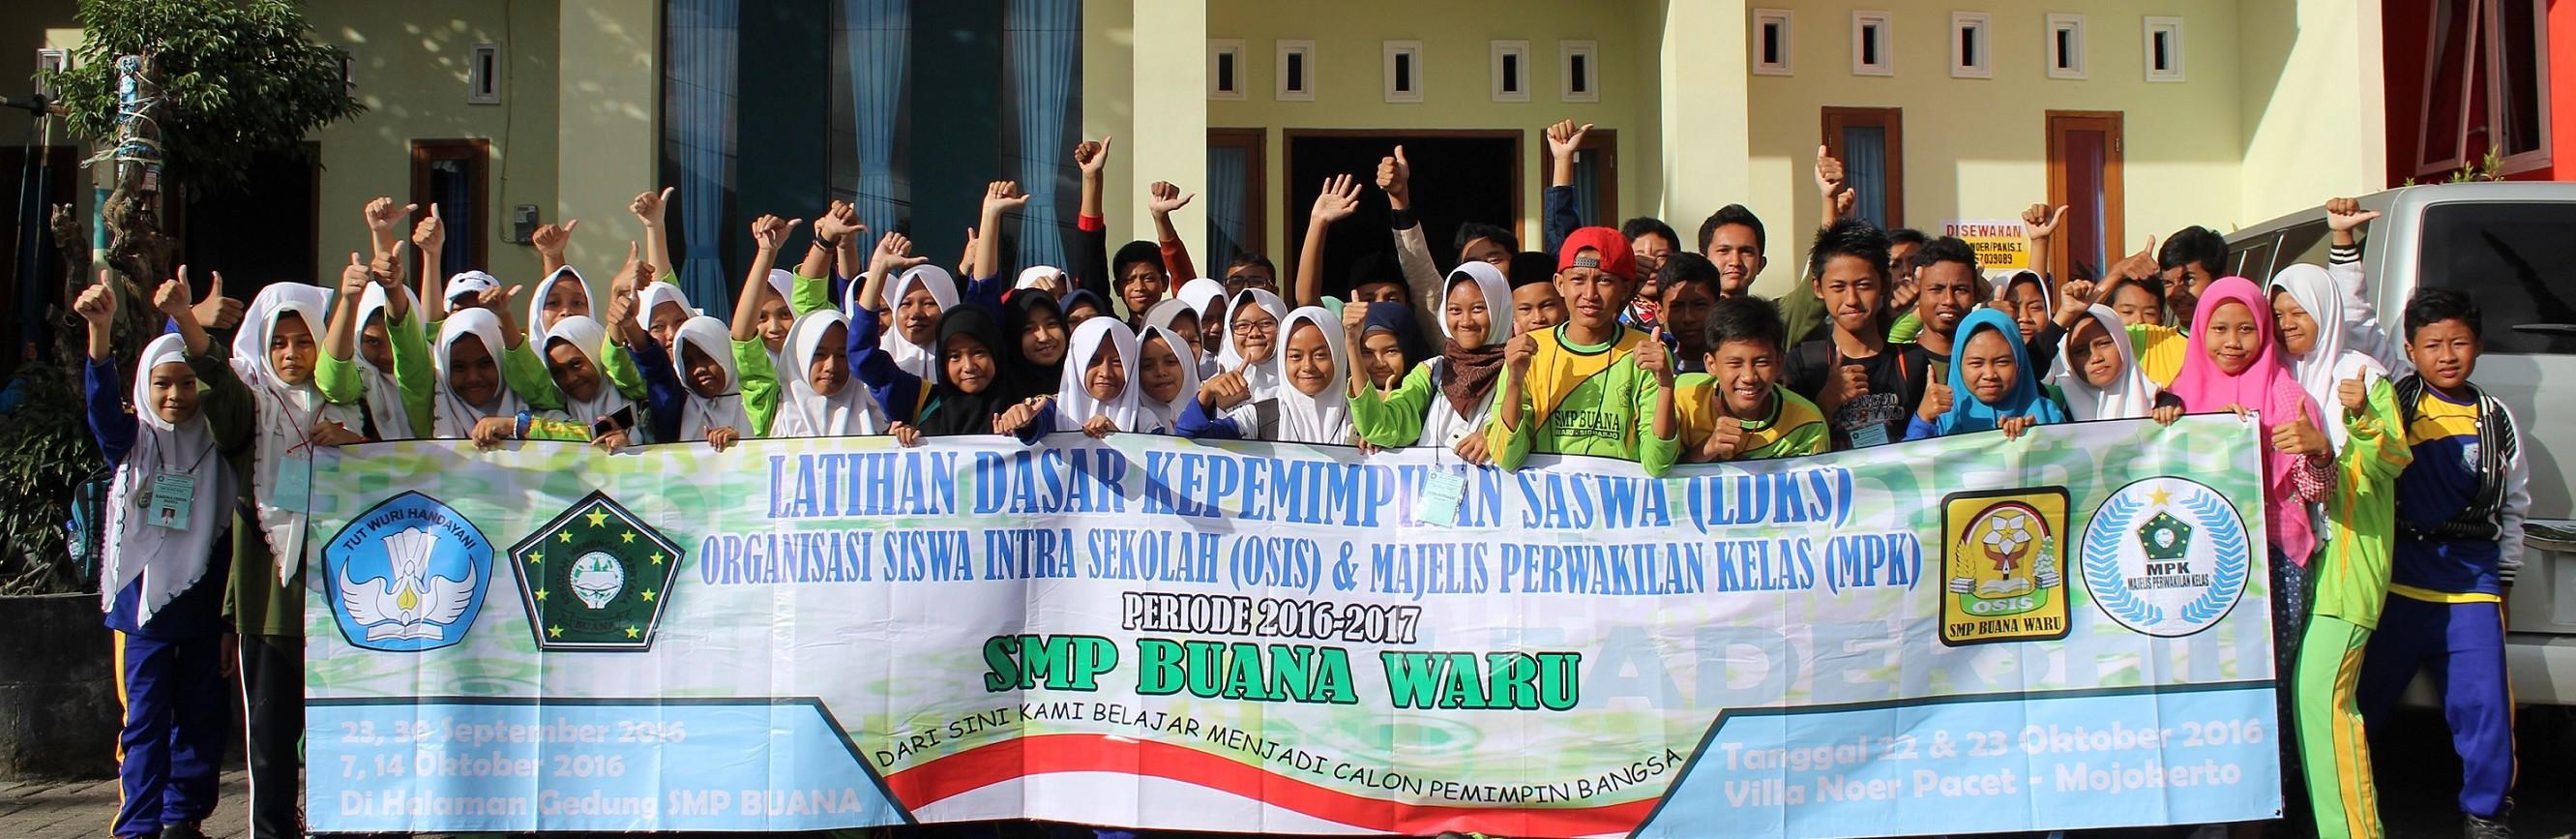 Serunya LDKS Osis dan MPK SMP Buana Masa Bakti 2016/2017 di Villa Katon + Nur Pacet